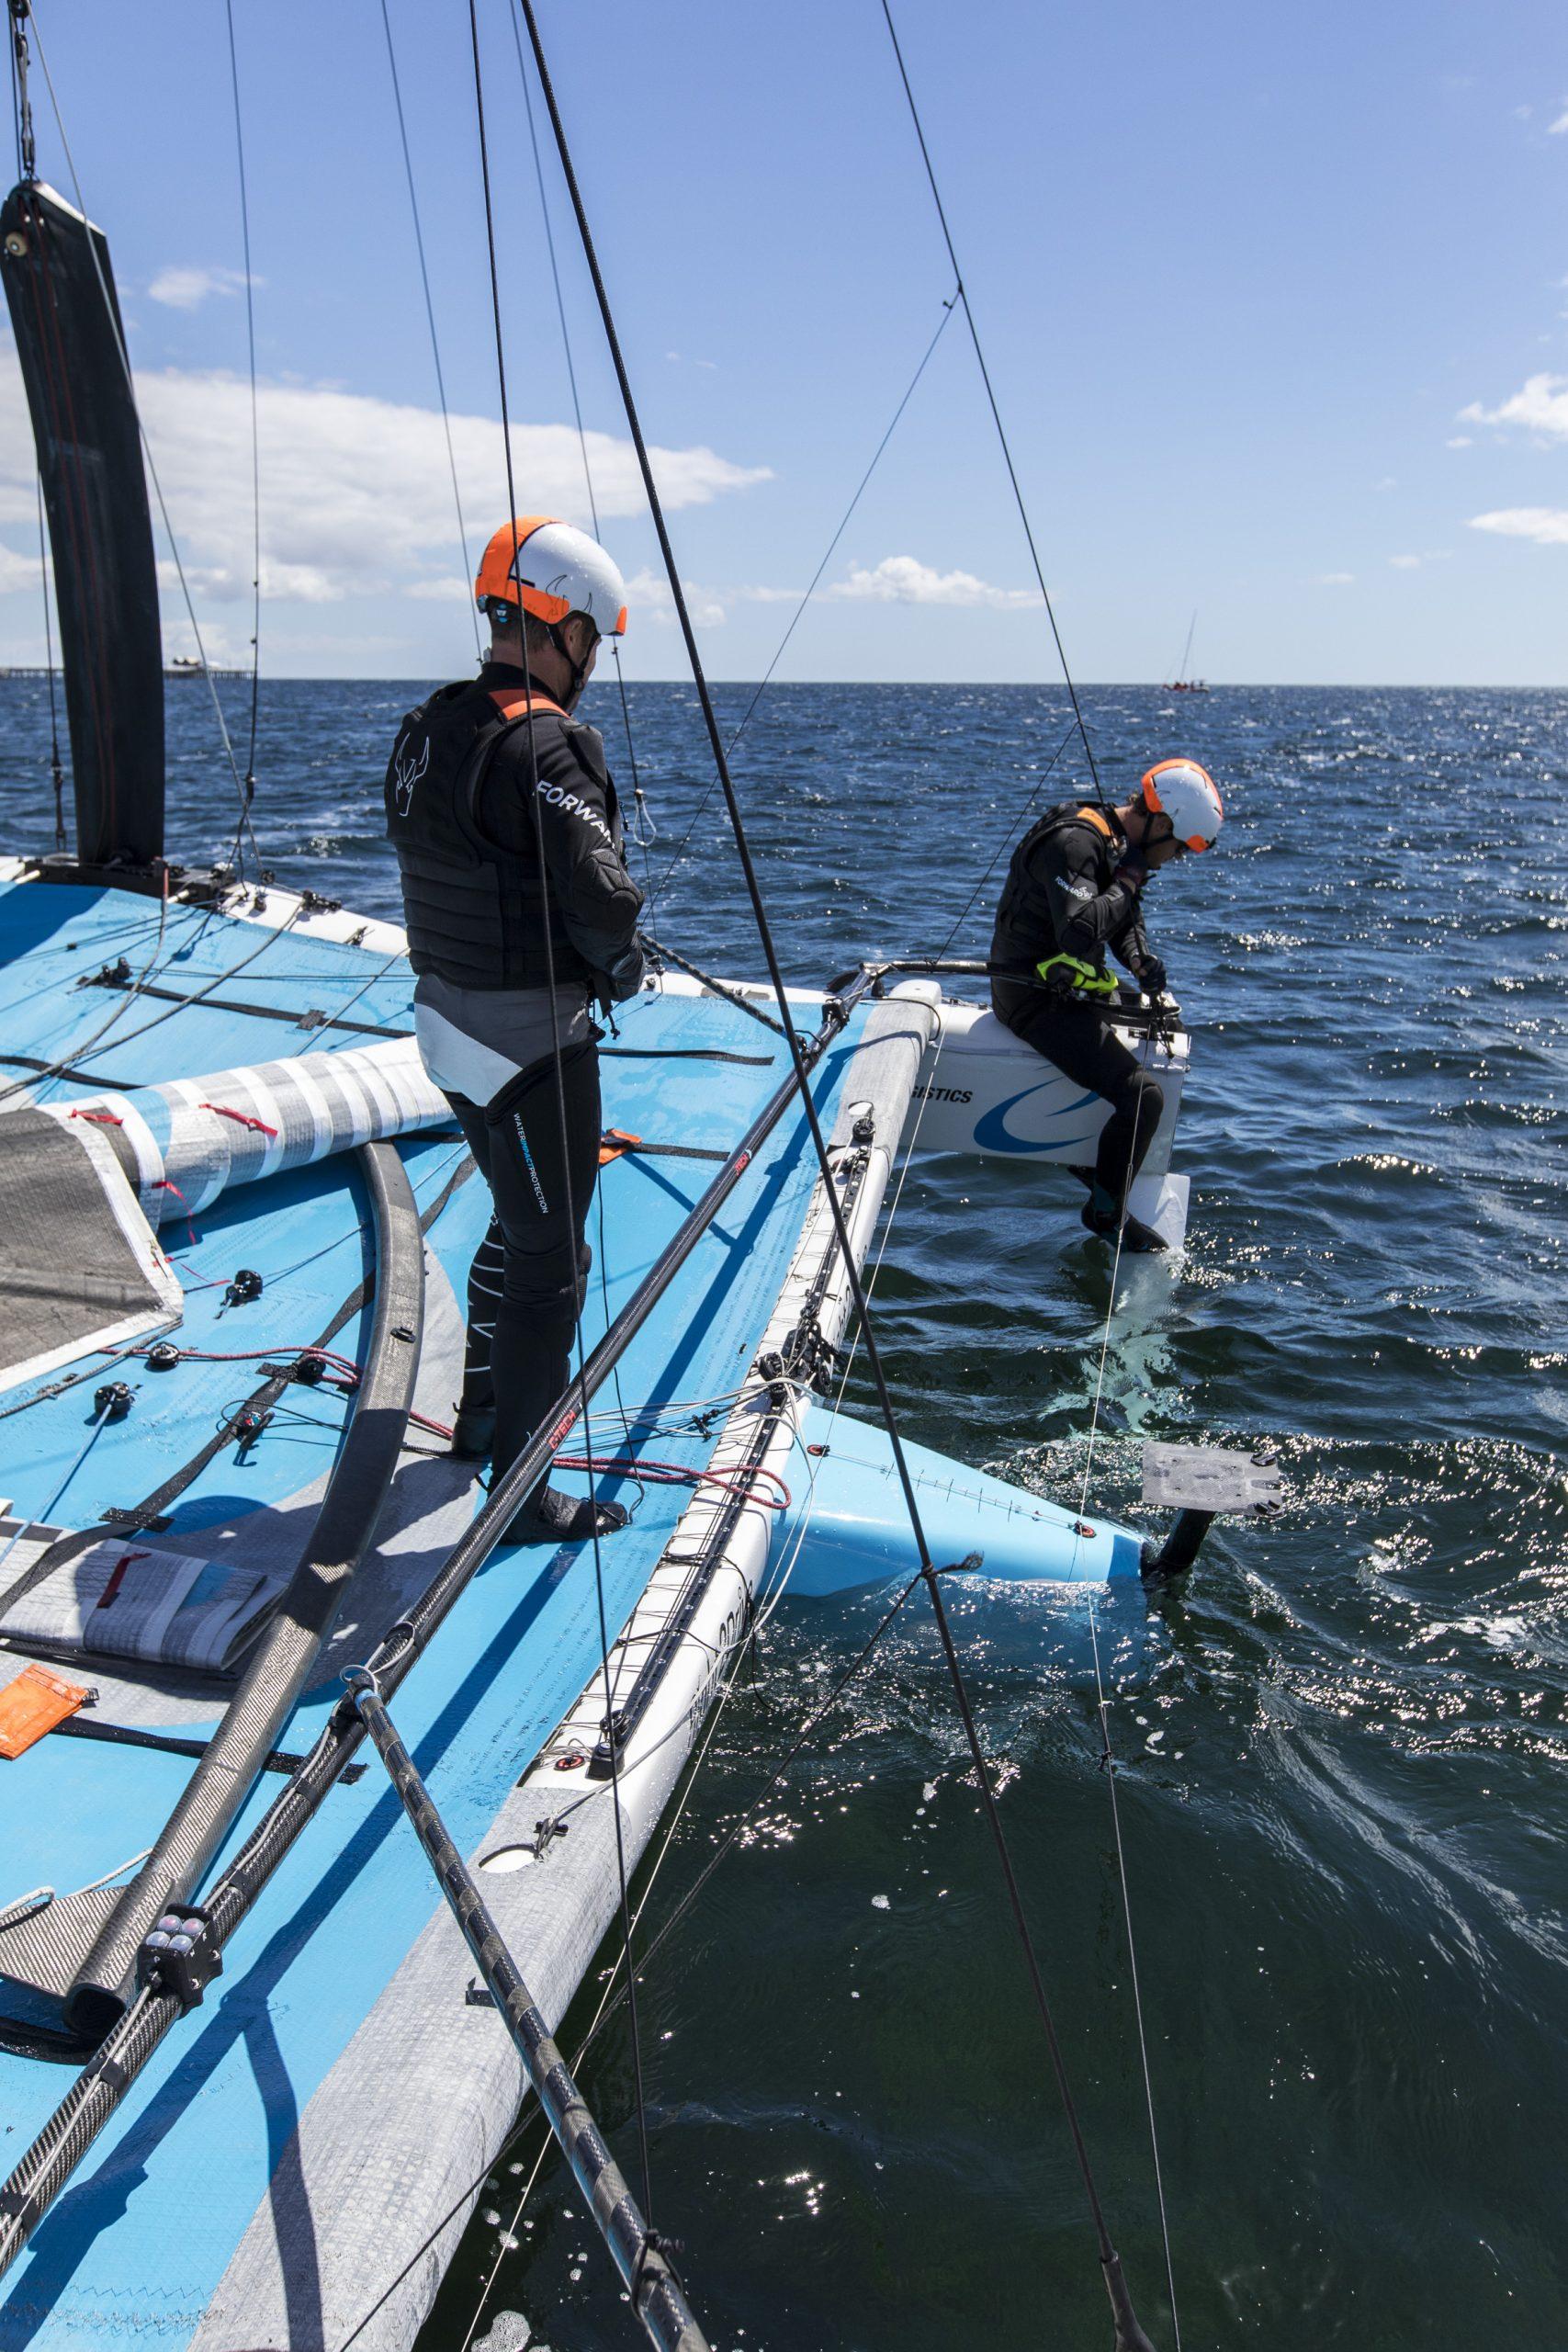 Assessing-the-damage-on-Euroflex---Andrea-Francolini-pic